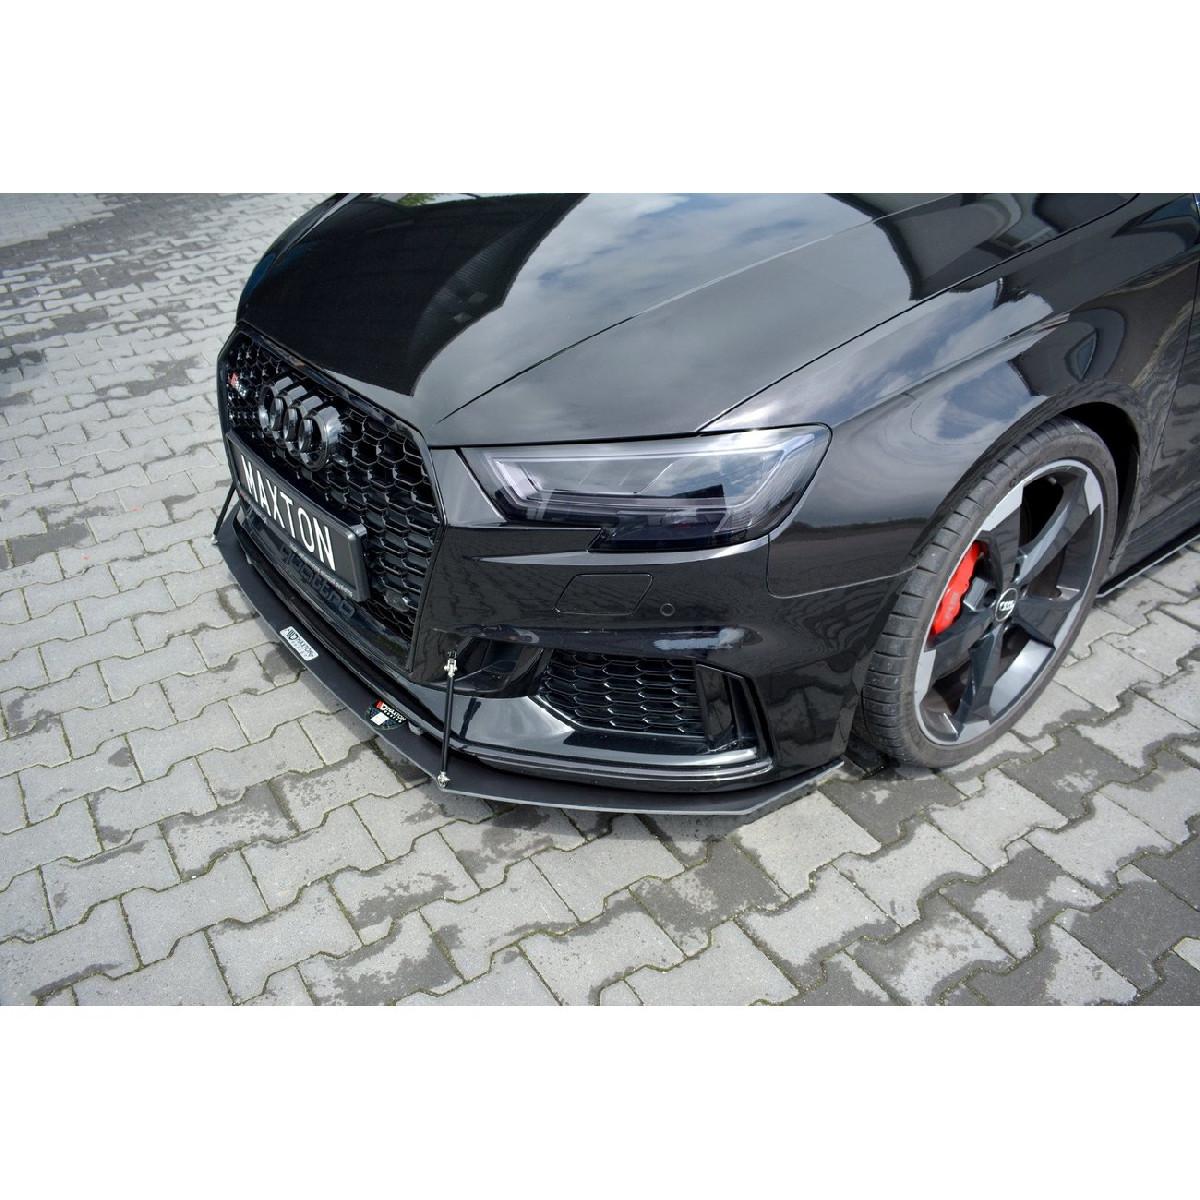 Racing Cup Spoilerlippe Front Ansatz für V.1 Audi RS3 8V FL Sportback